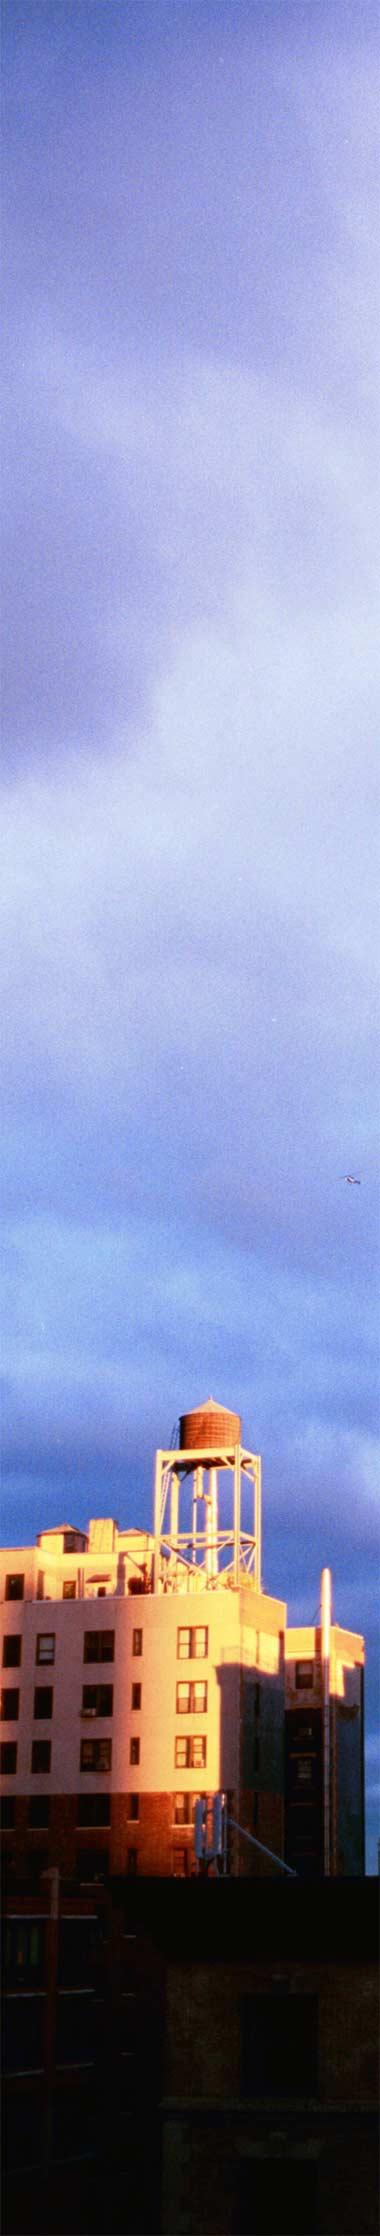 skypter.jpg